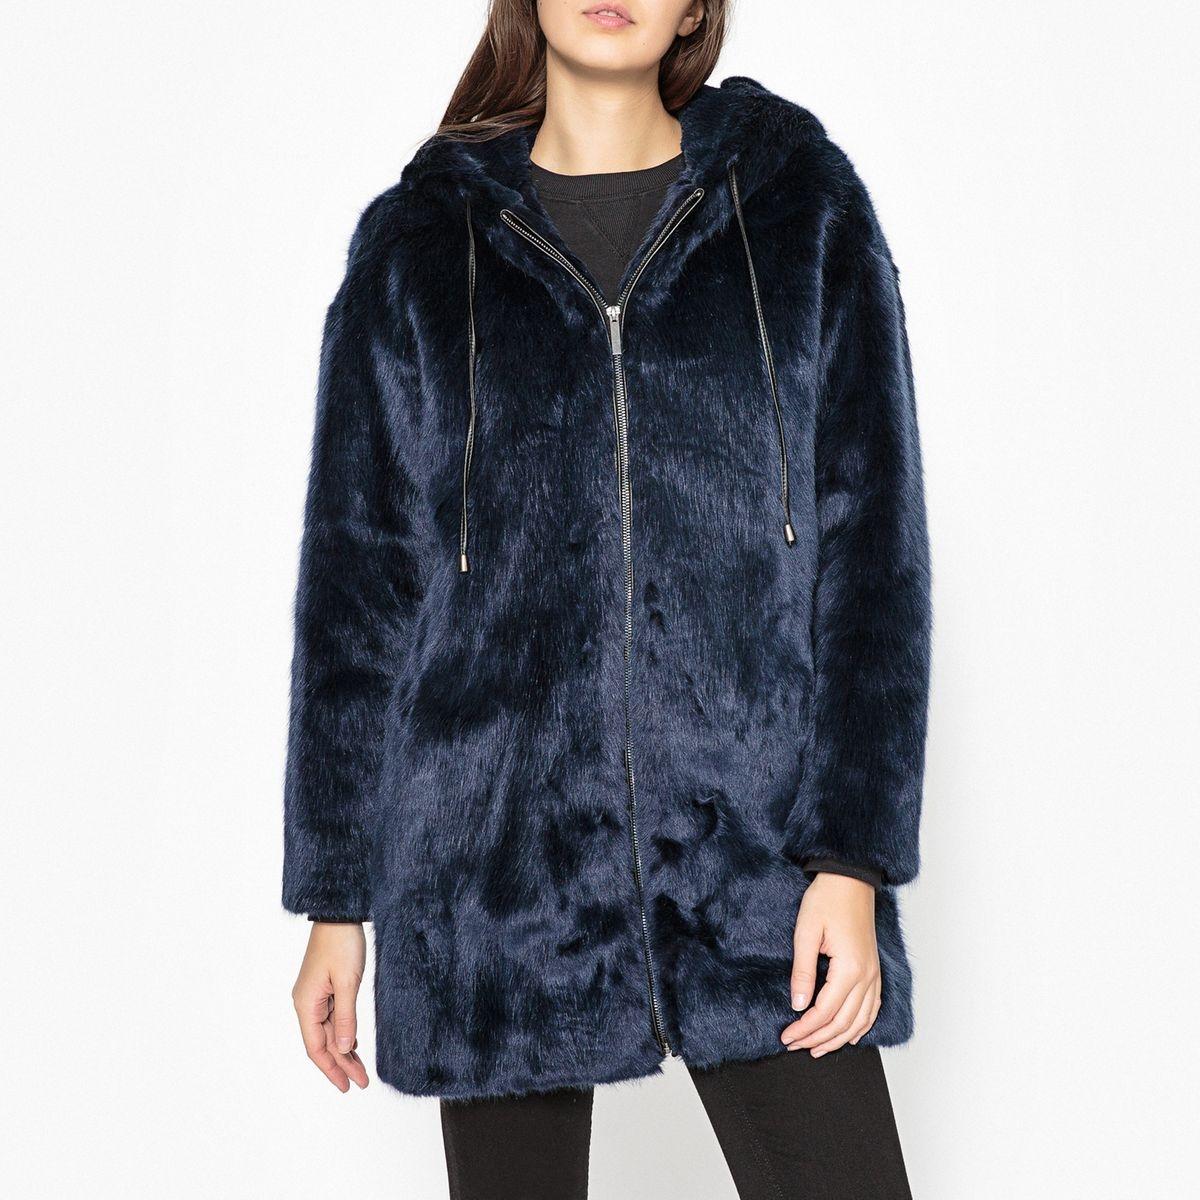 Manteau à capuche en tissu aspect fourrure OMONADE